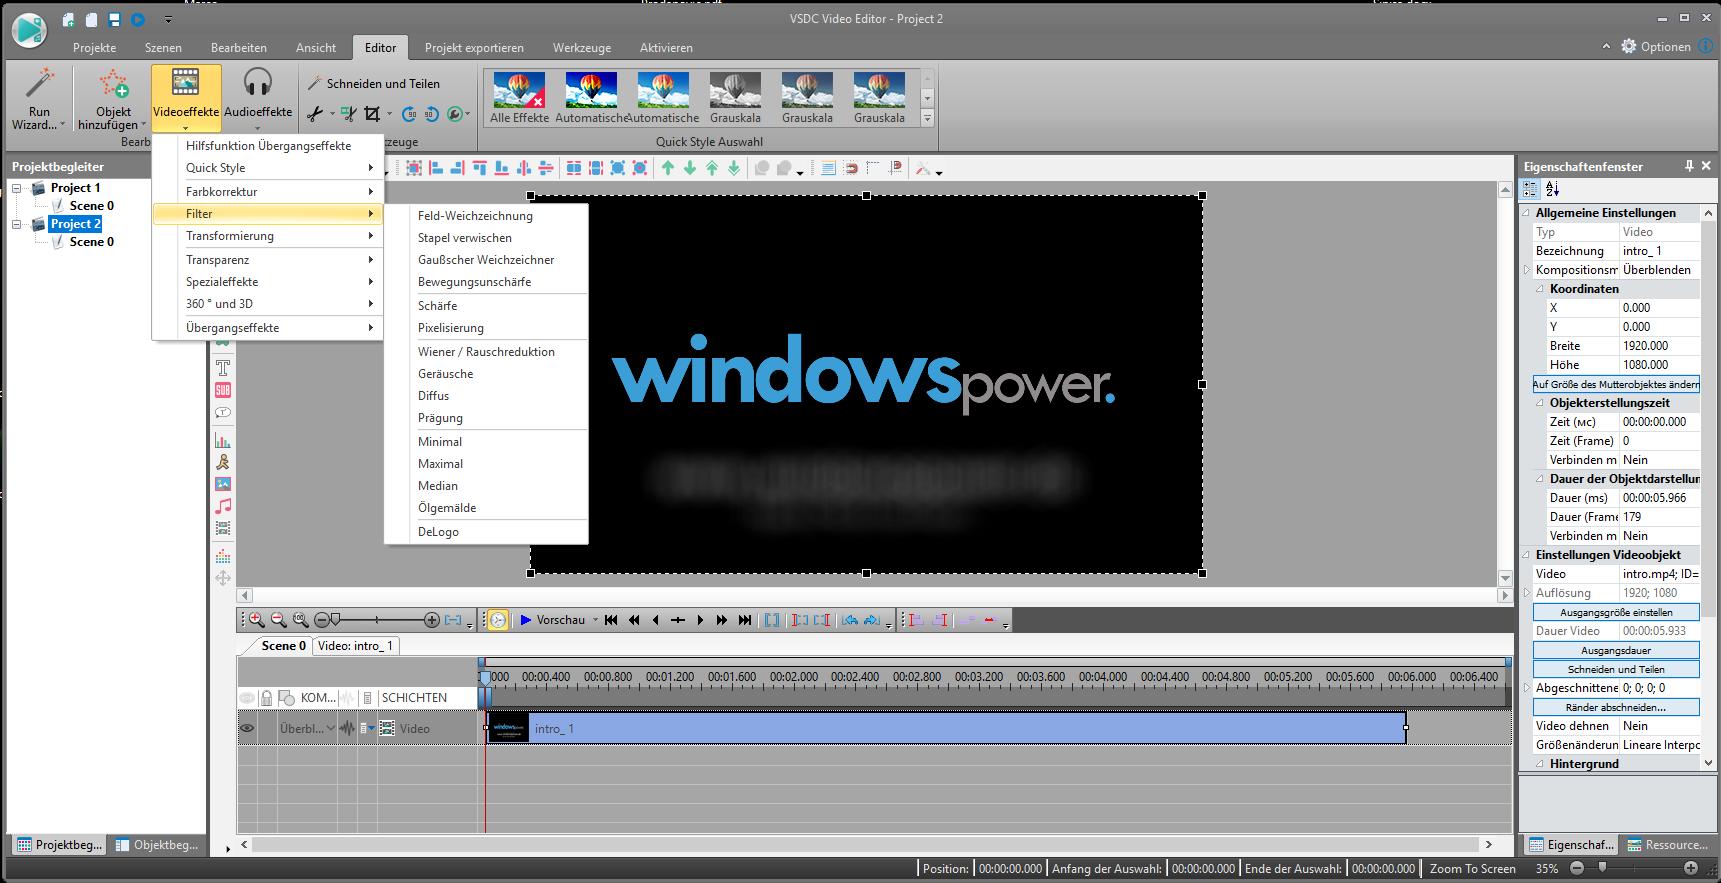 3 - VDSC Multi Video Editor Multi Tool - Wir verlosen 5 Lizenzen